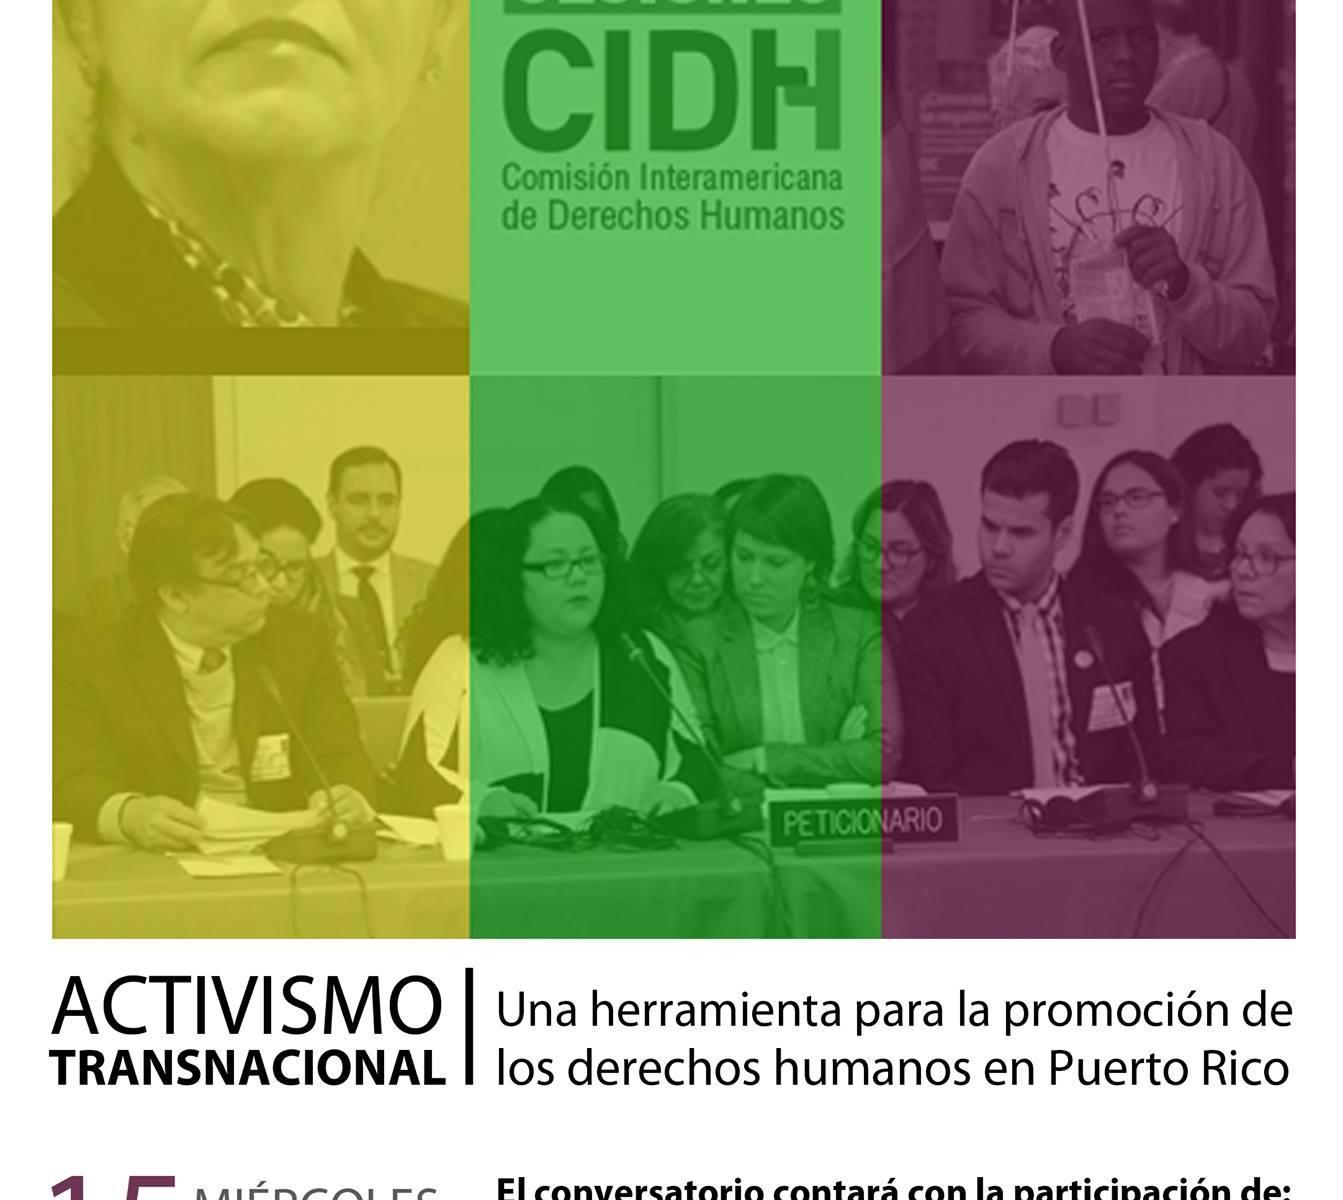 Activismo Transnacional ILSA Pangea